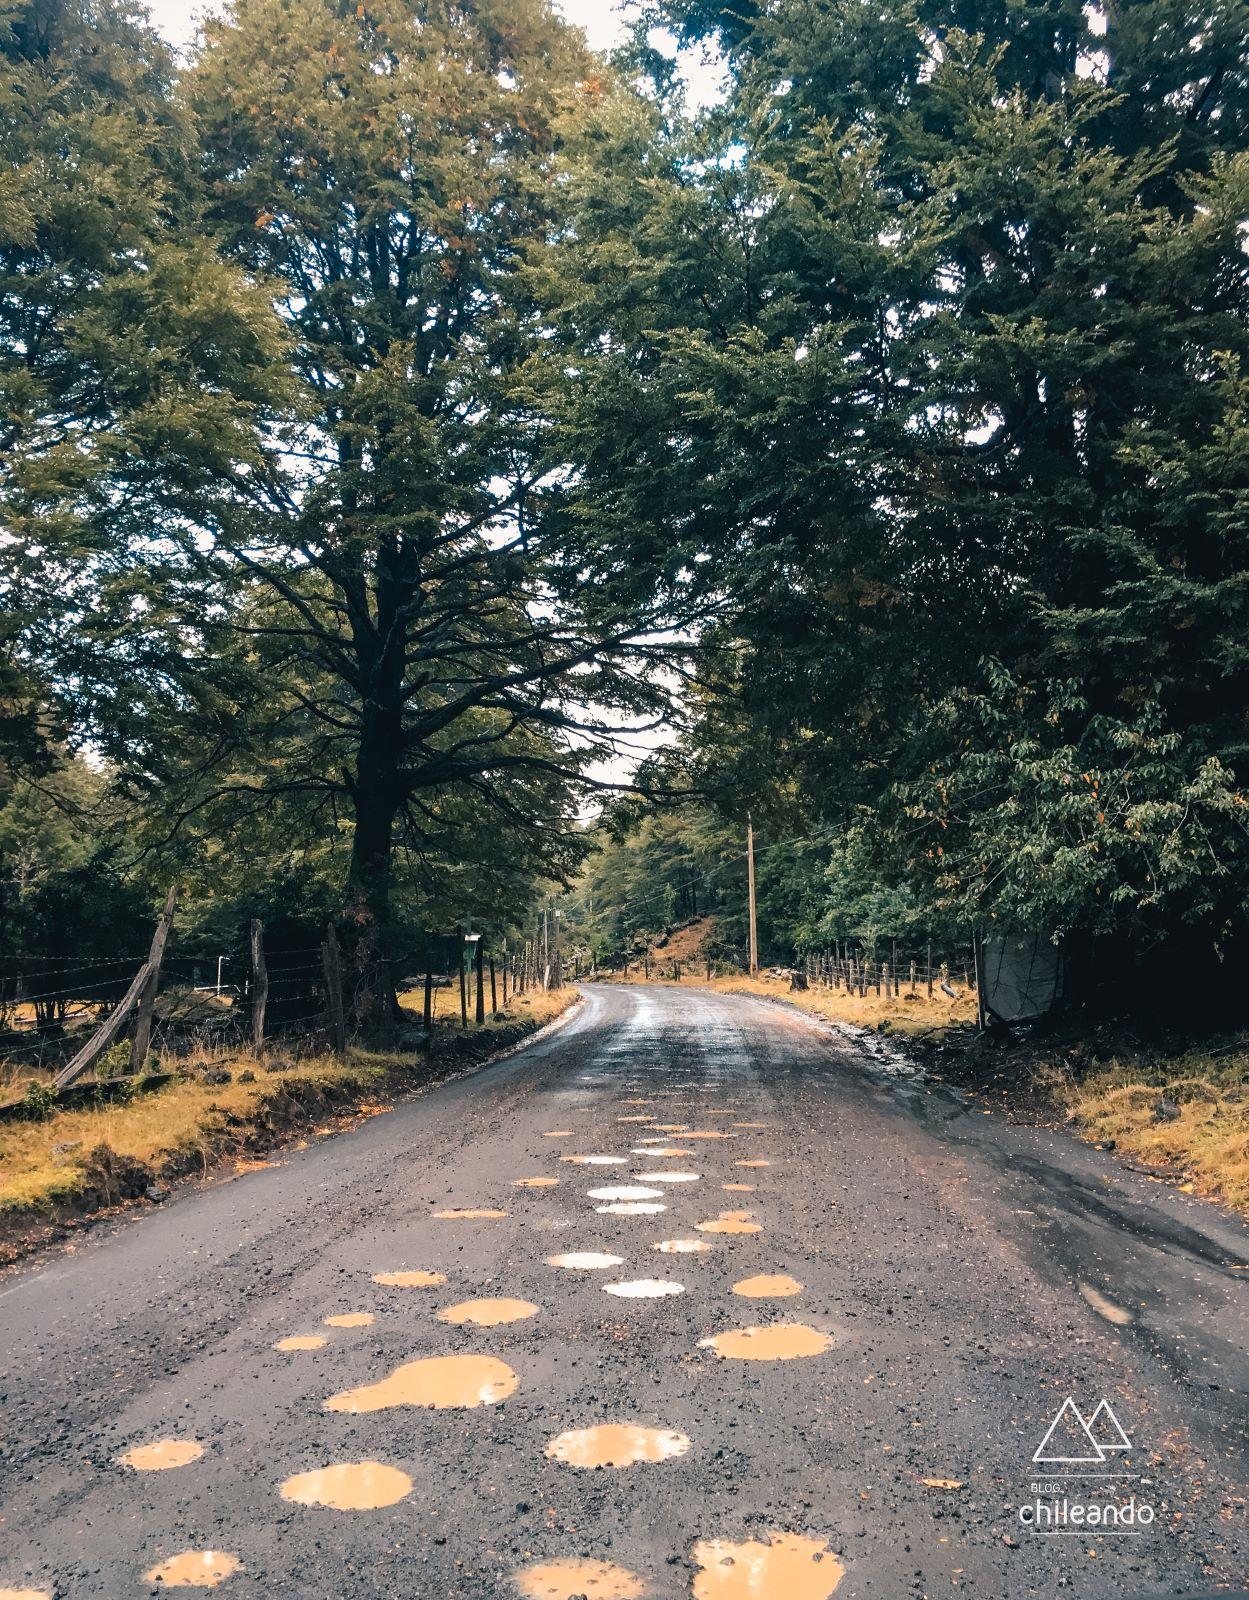 Trecho de estrada sem asfalto